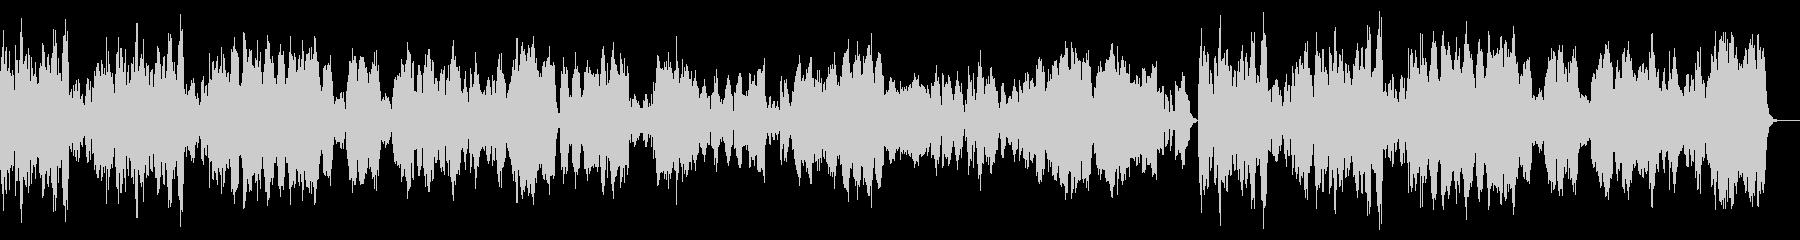 BWV1070/4『メヌエット・トリオ』の未再生の波形